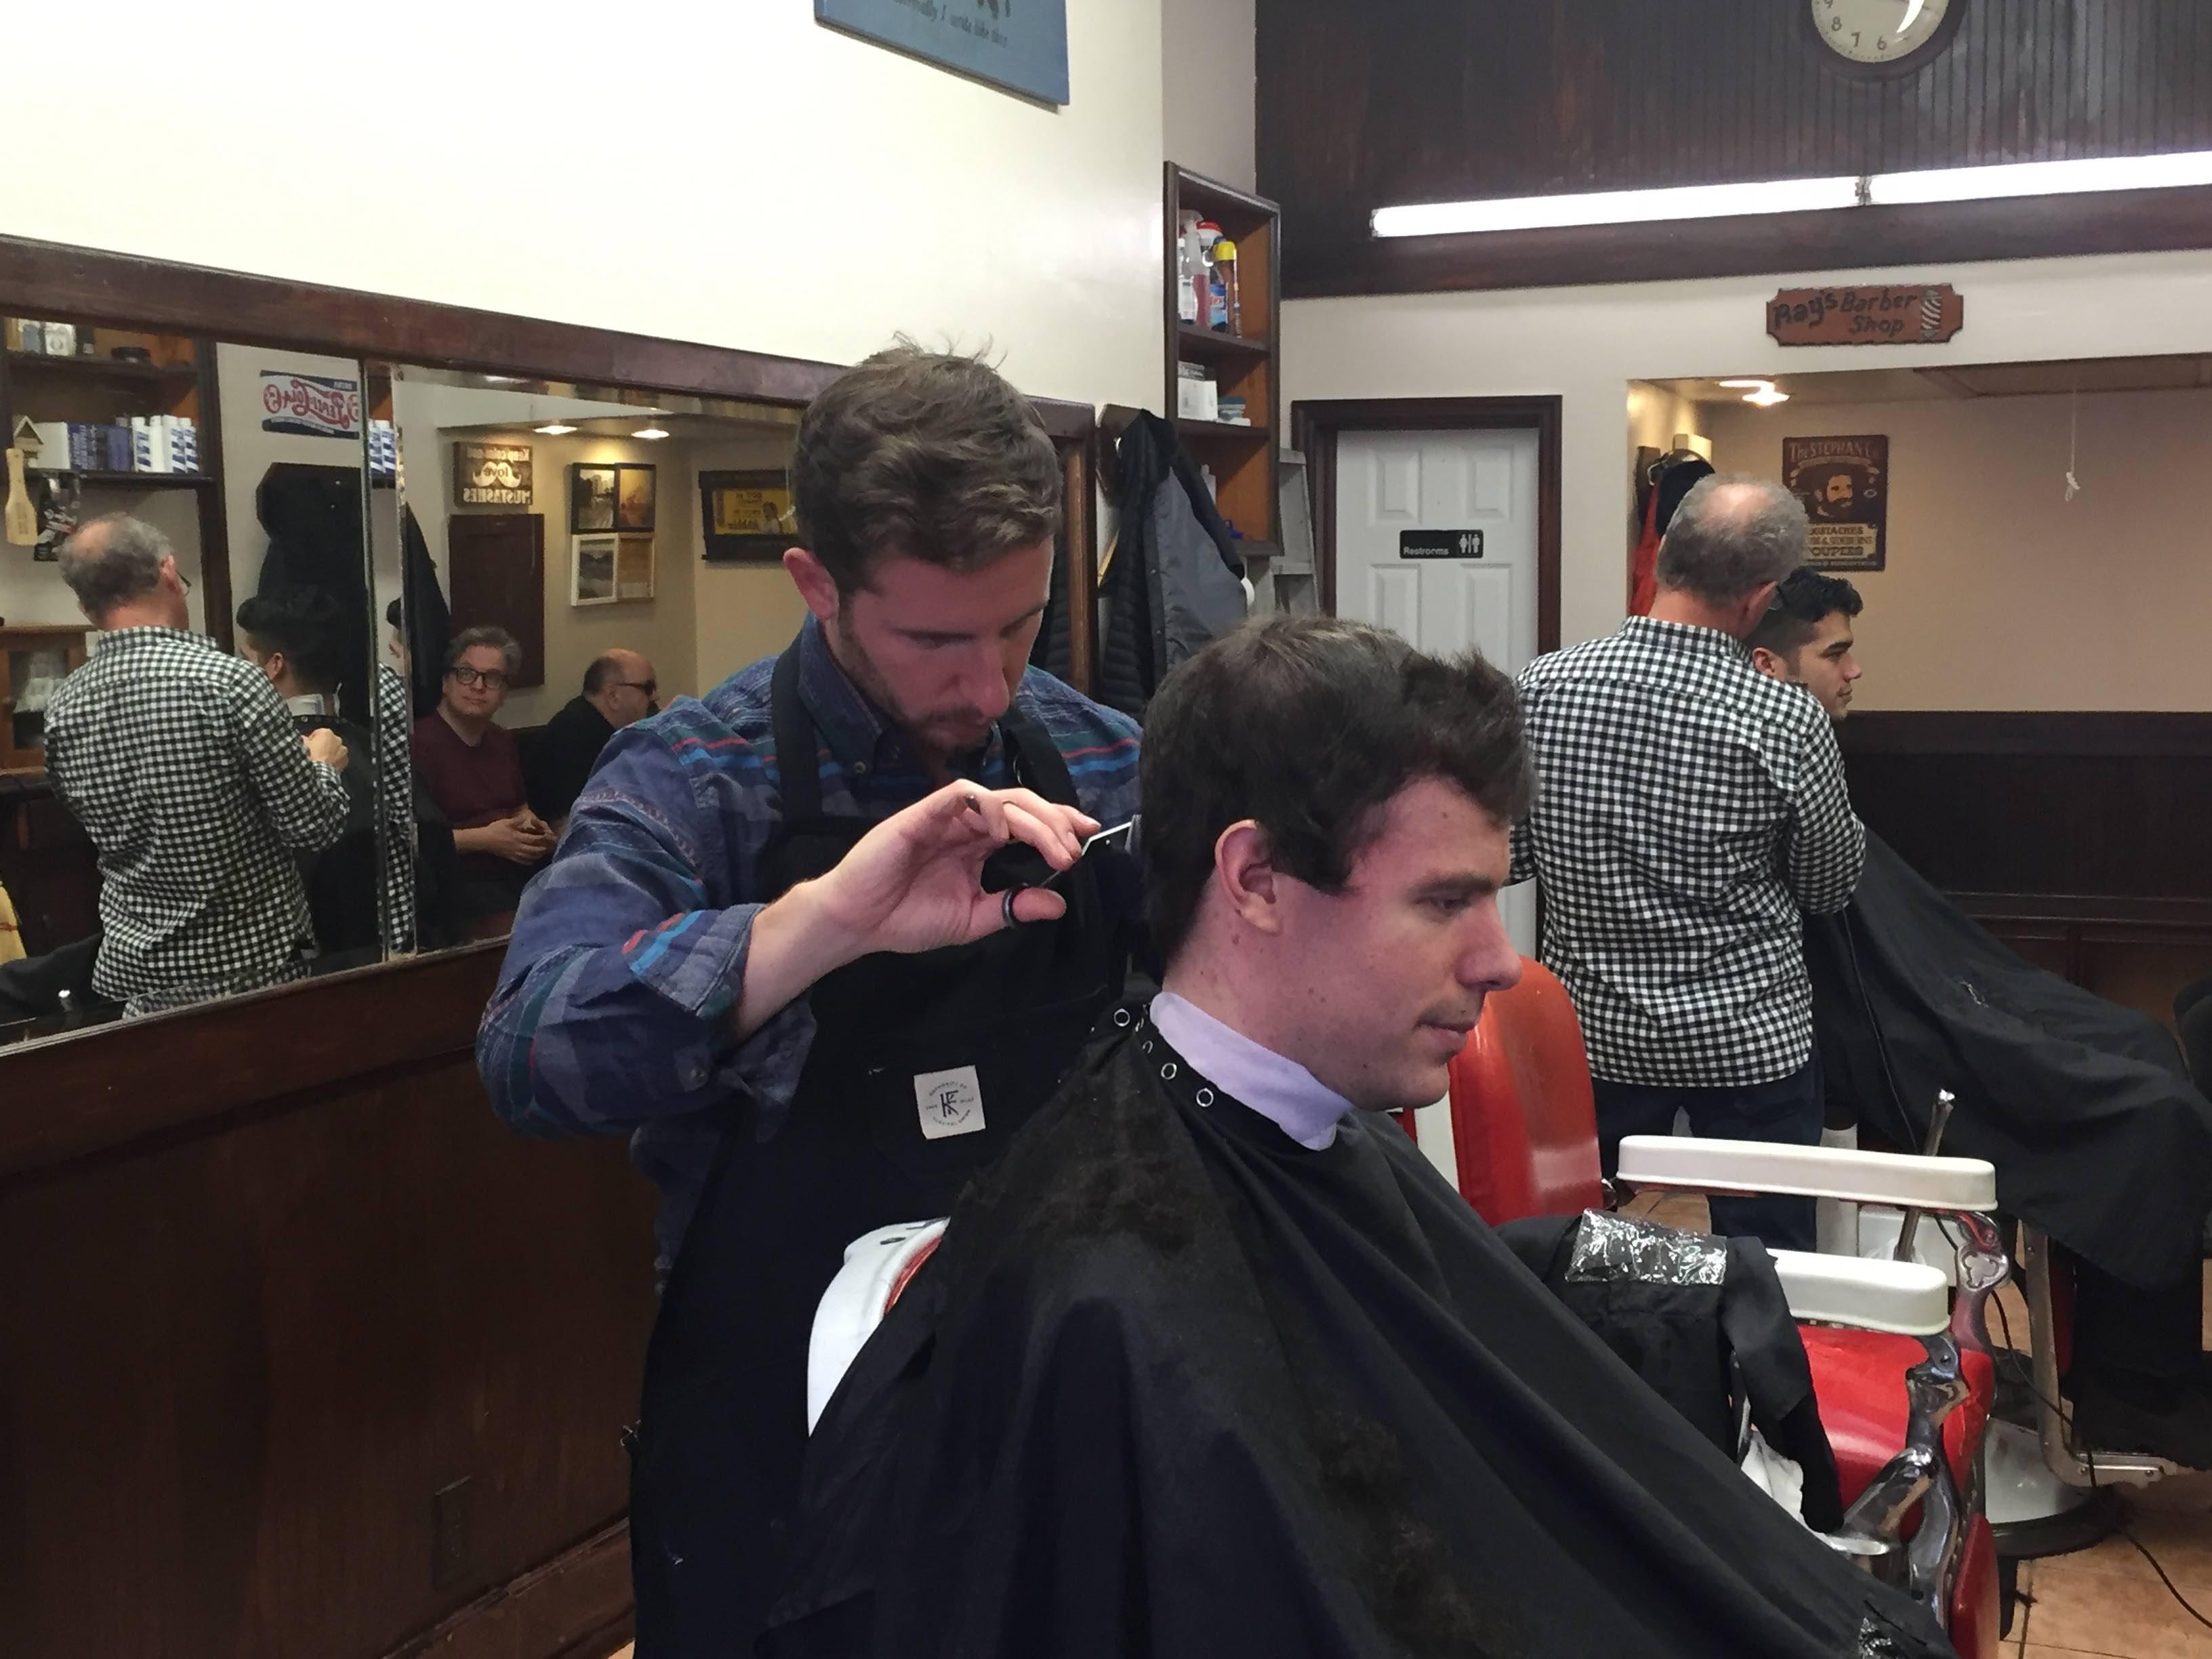 Ray Jr. cutting hair at Ray's Barber Shop in Inwood NY